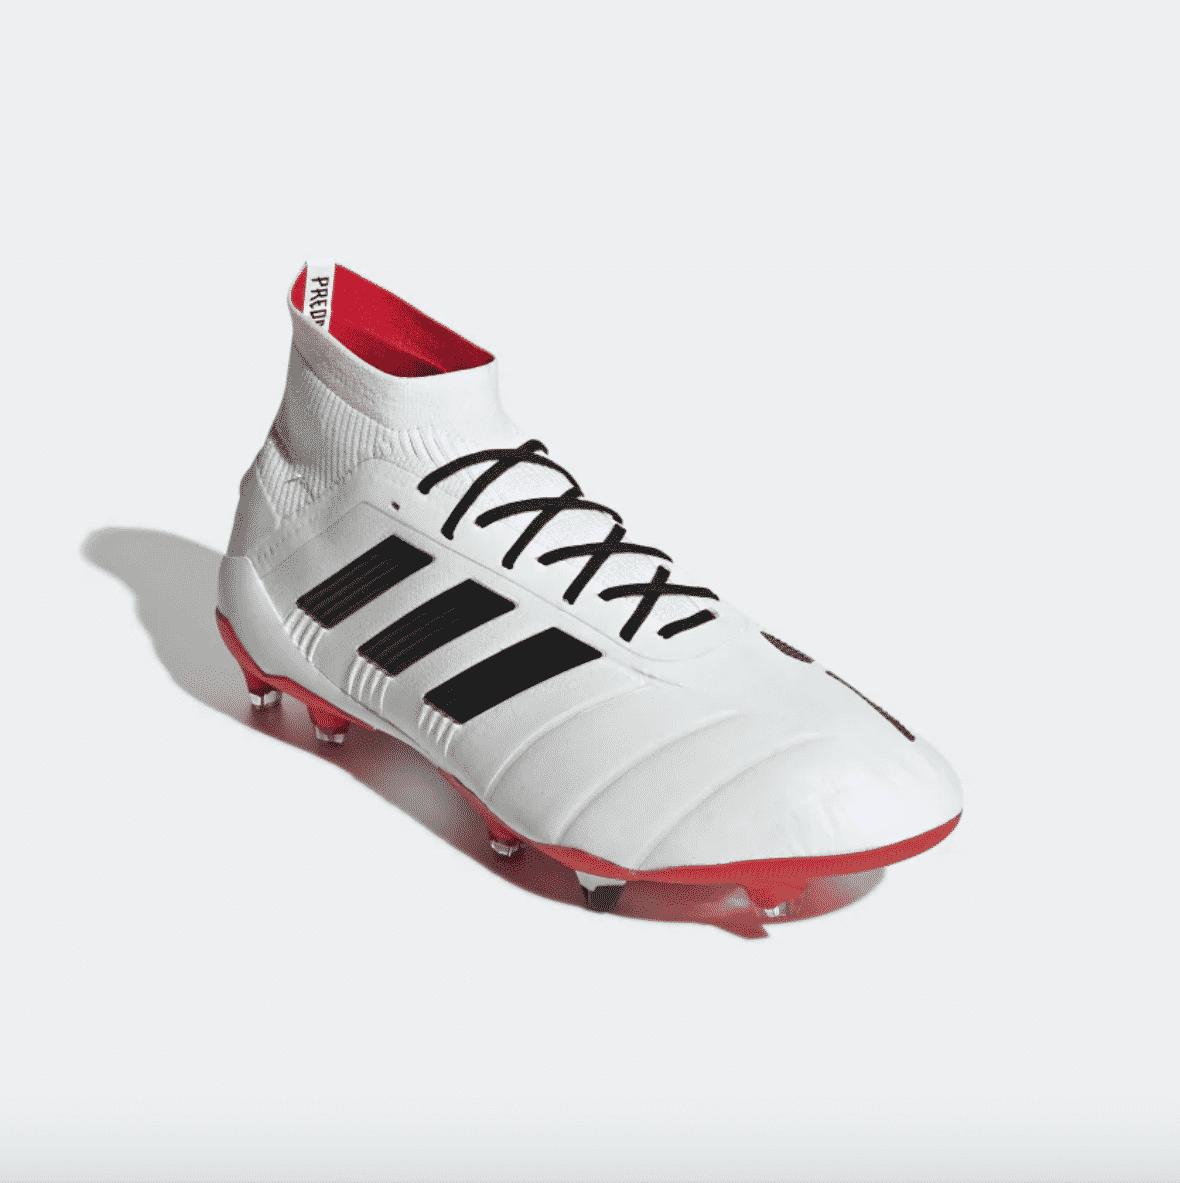 adidas-predator-19.1-reedition-predator-mania-blanc-4